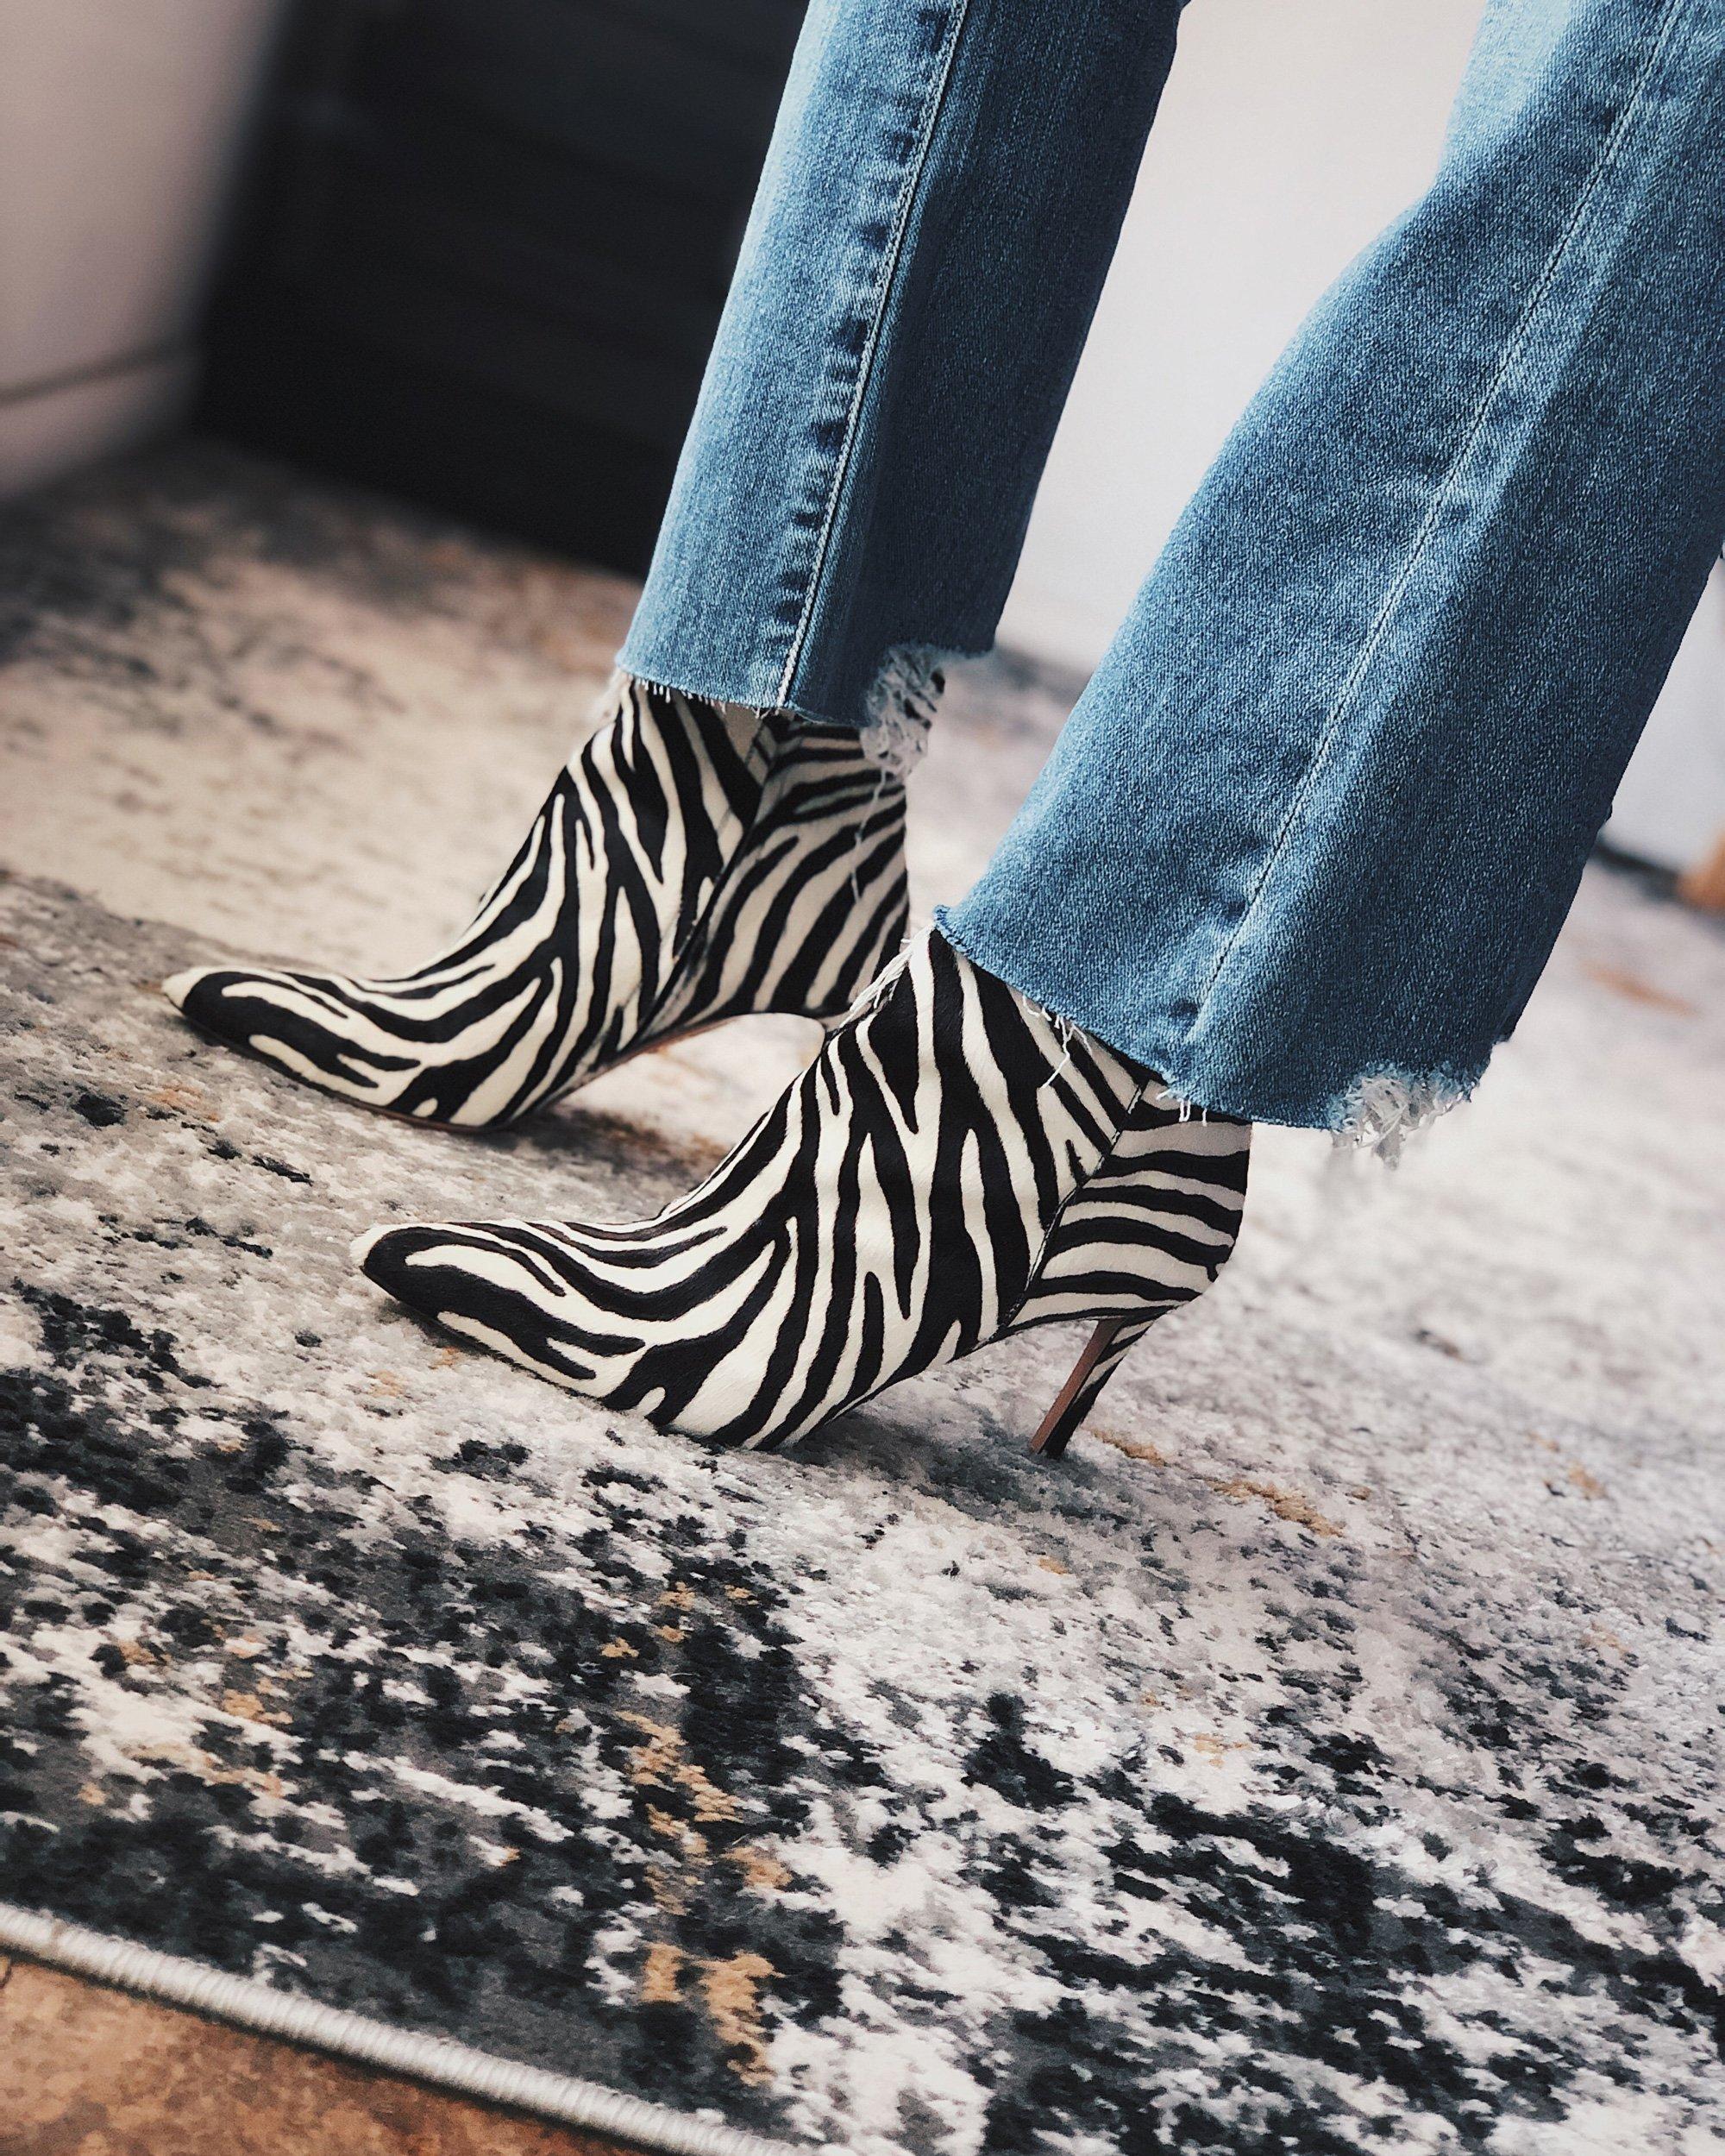 Zebra Boots